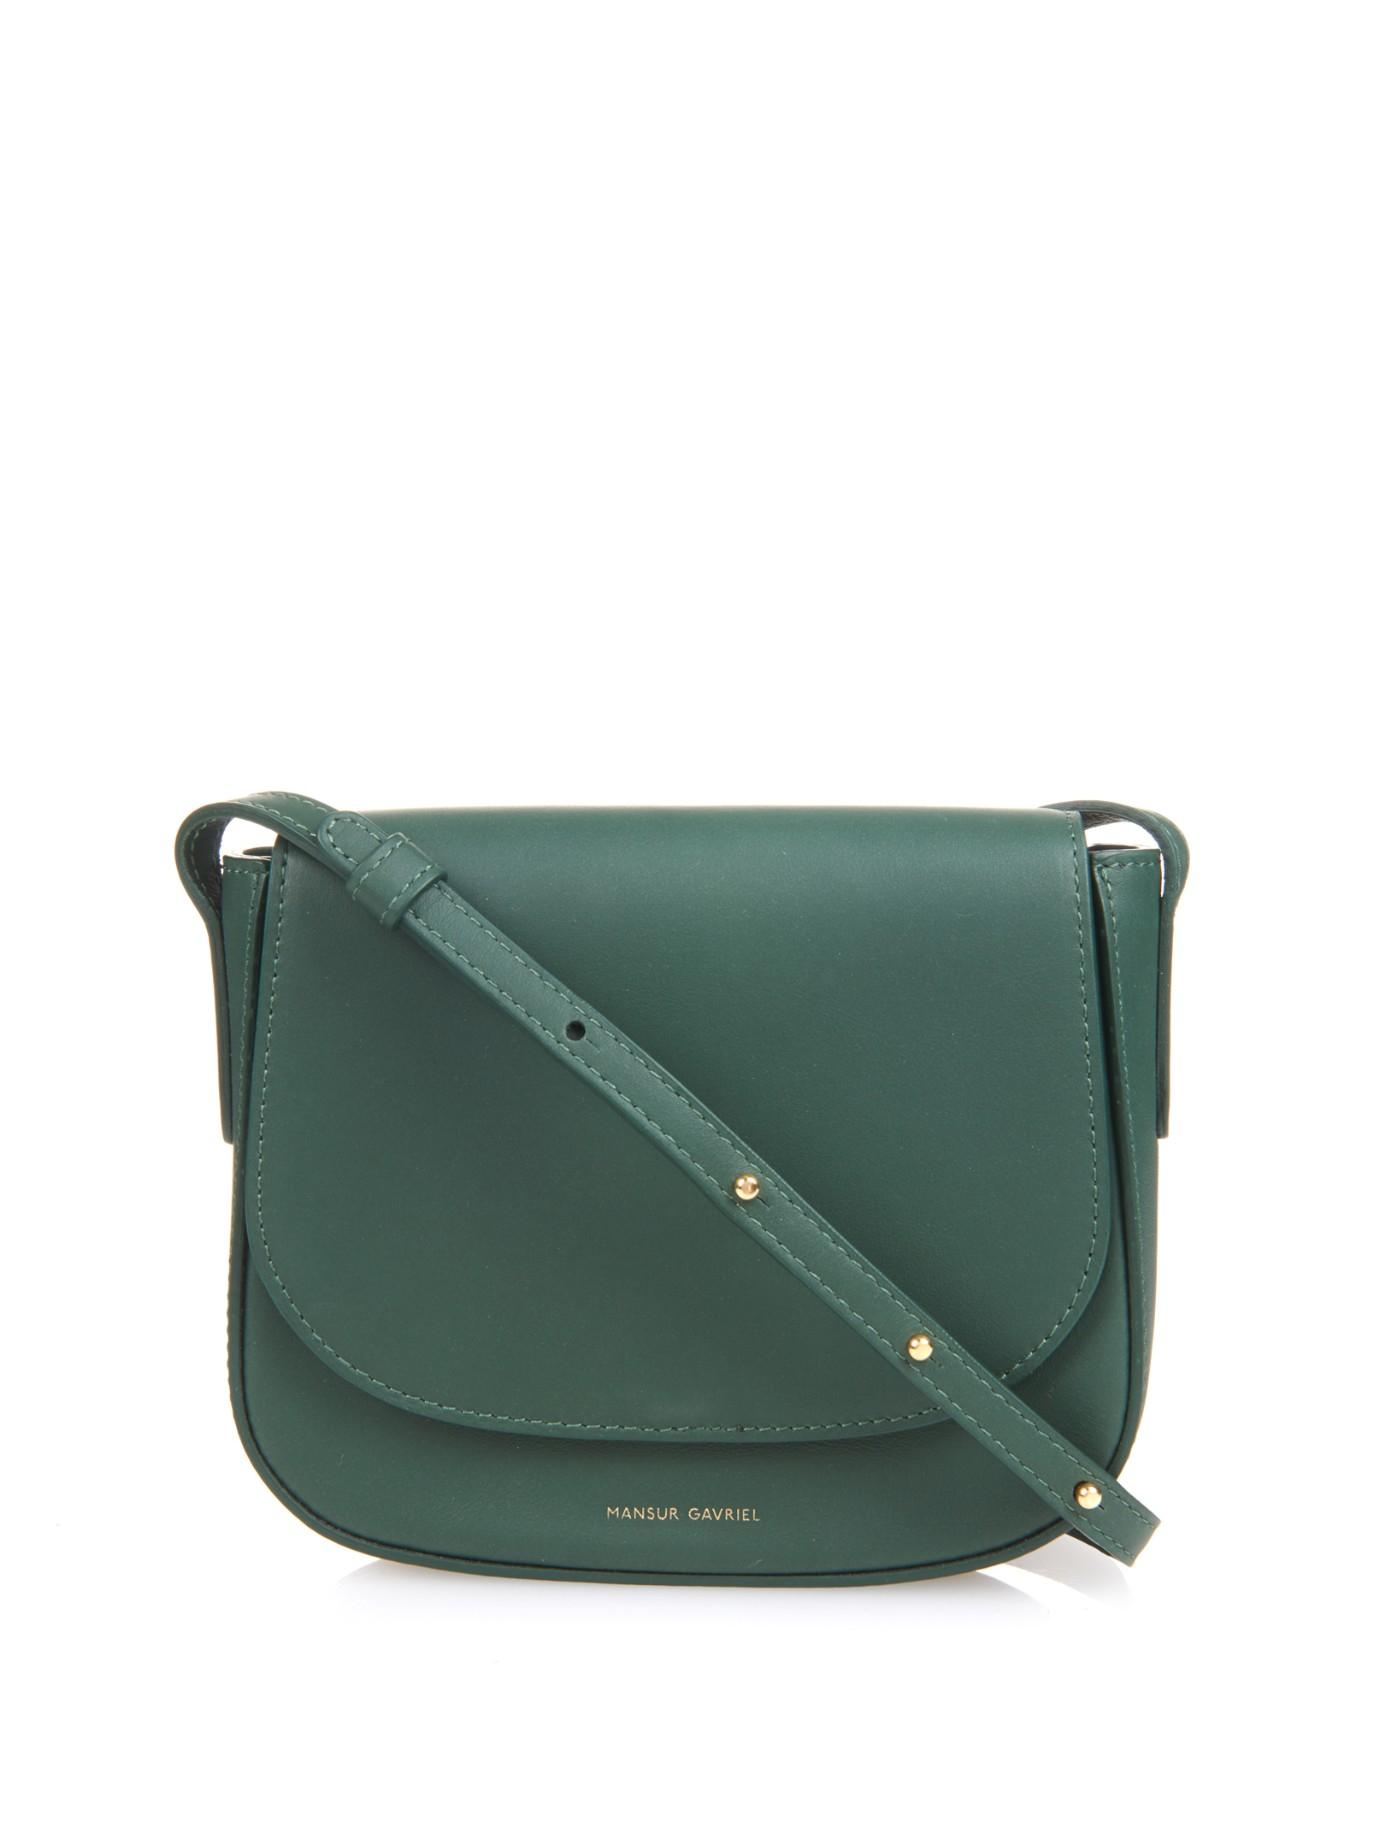 a734848b4fd5 Lyst - Mansur Gavriel Mini Calf-Leather Cross-Body Bag in Green